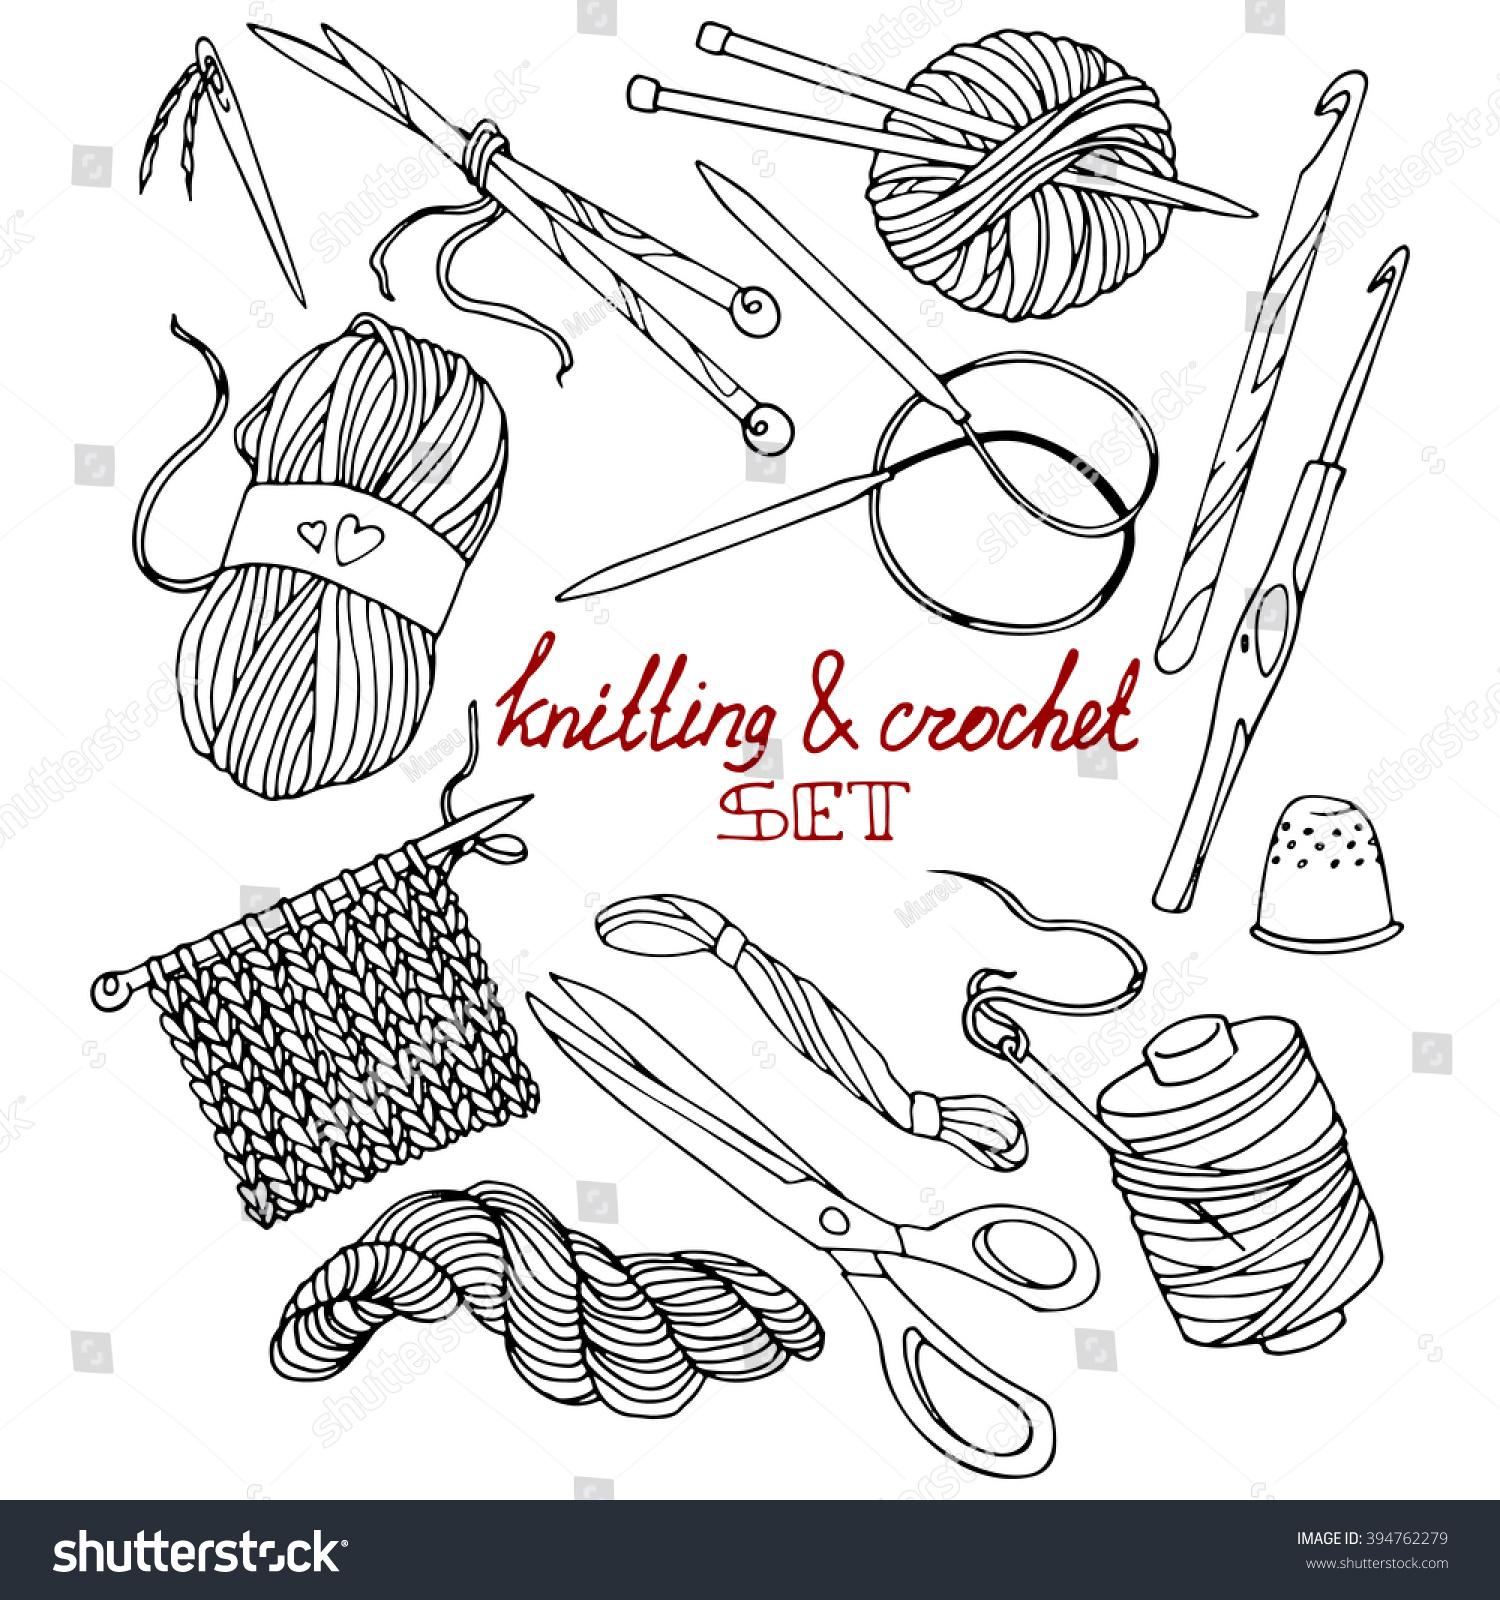 Hands Knitting Drawing : Knitting crochet set contour drawings handdrawn stock